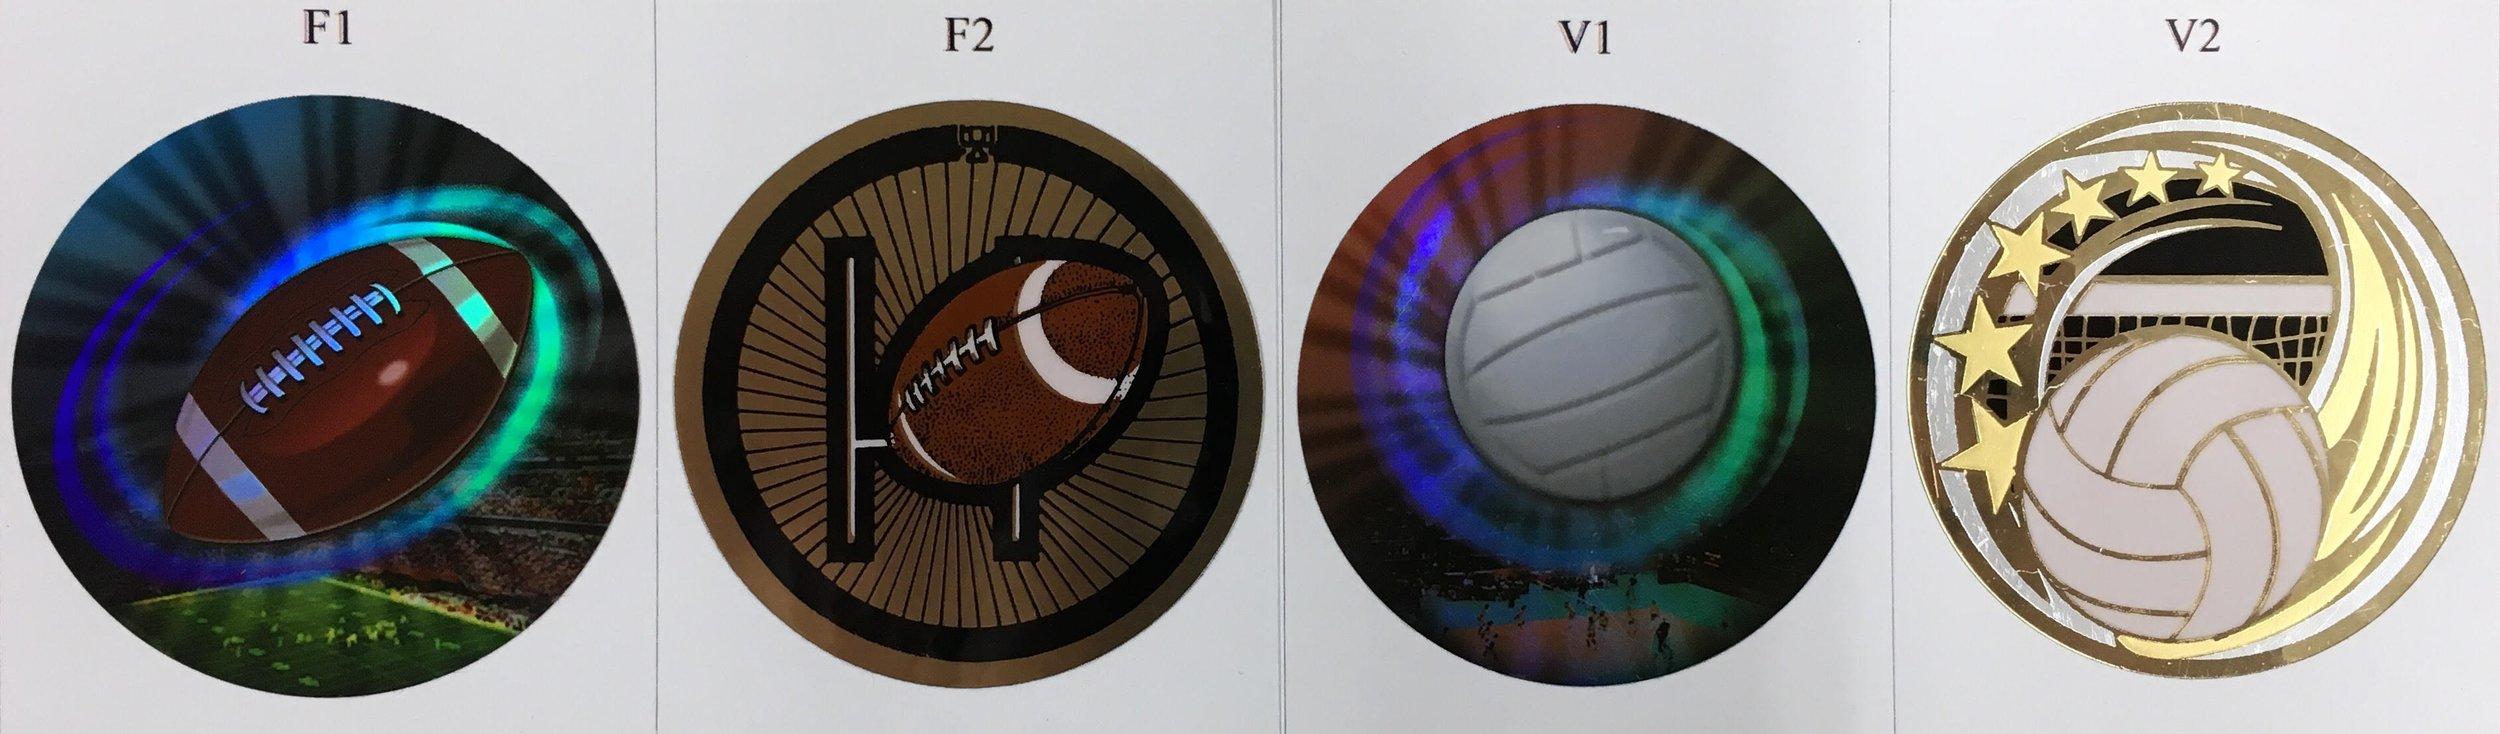 Football Mylars.jpg